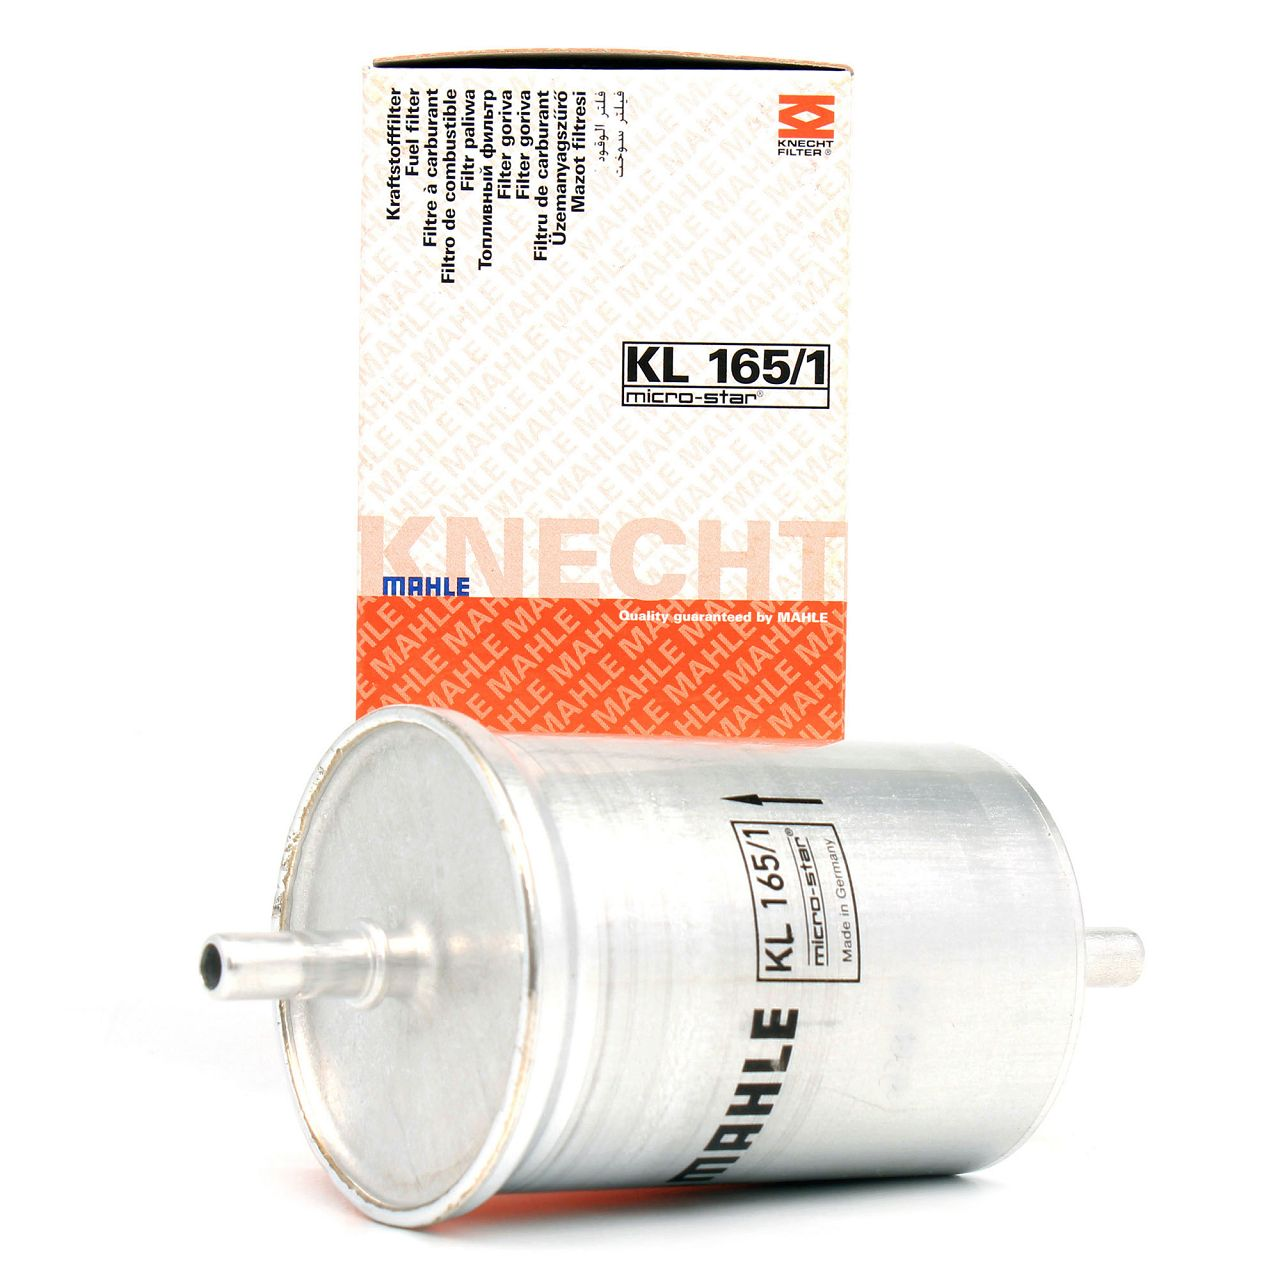 KNECHT / MAHLE Kraftstofffilter Dieselfilter für Smart Fortwo 0.8CDI KL165/1